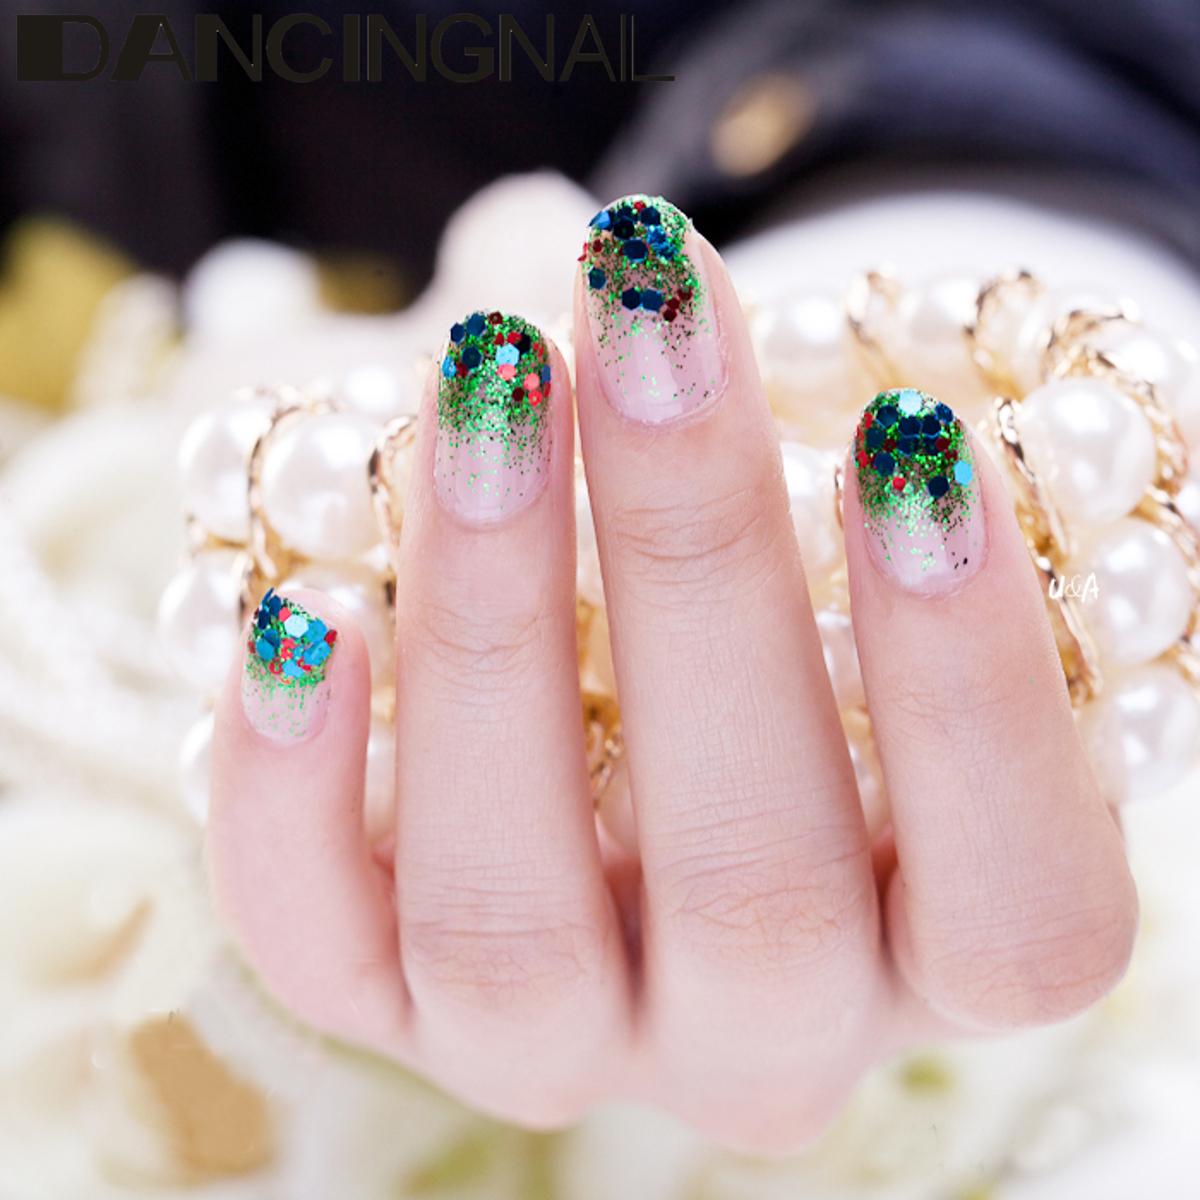 4 x Pots Glitter Powder Sequins. More Detailed Photos  4 box 10ml Green  Iridescent Nail ... c63307e7d1a6